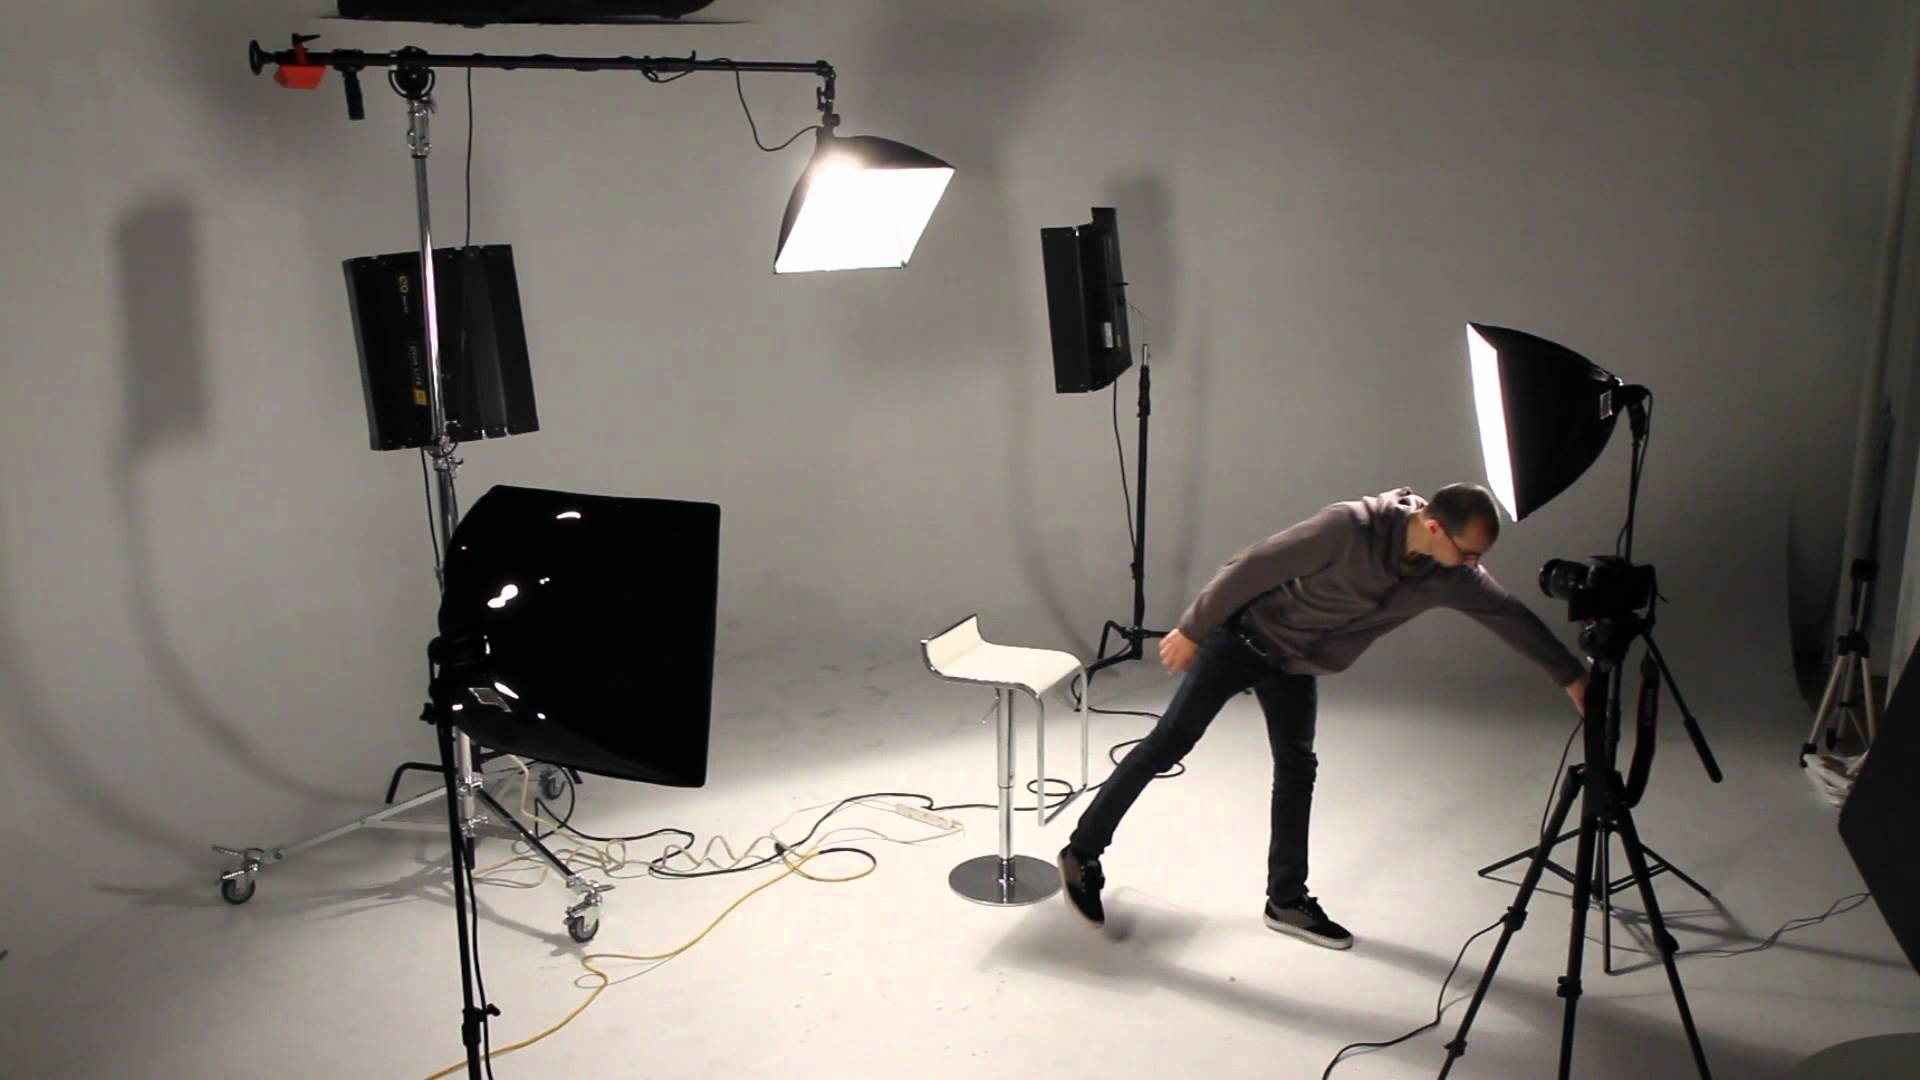 How to Ensure Proper Lighting for YouTube Videos